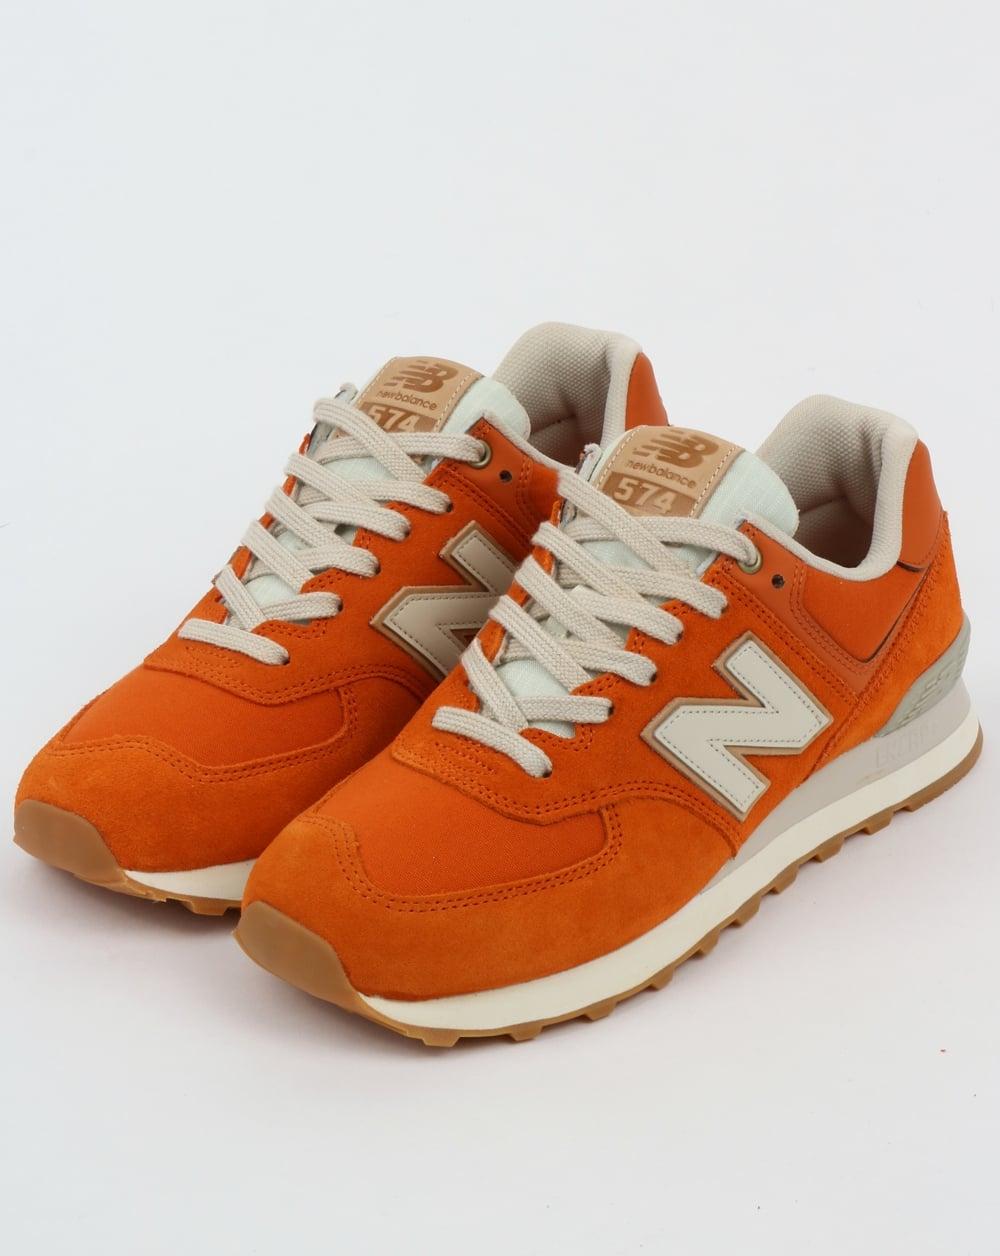 low priced 88c7c 37899 New Balance 574 Trainers Orange/Moonbeam